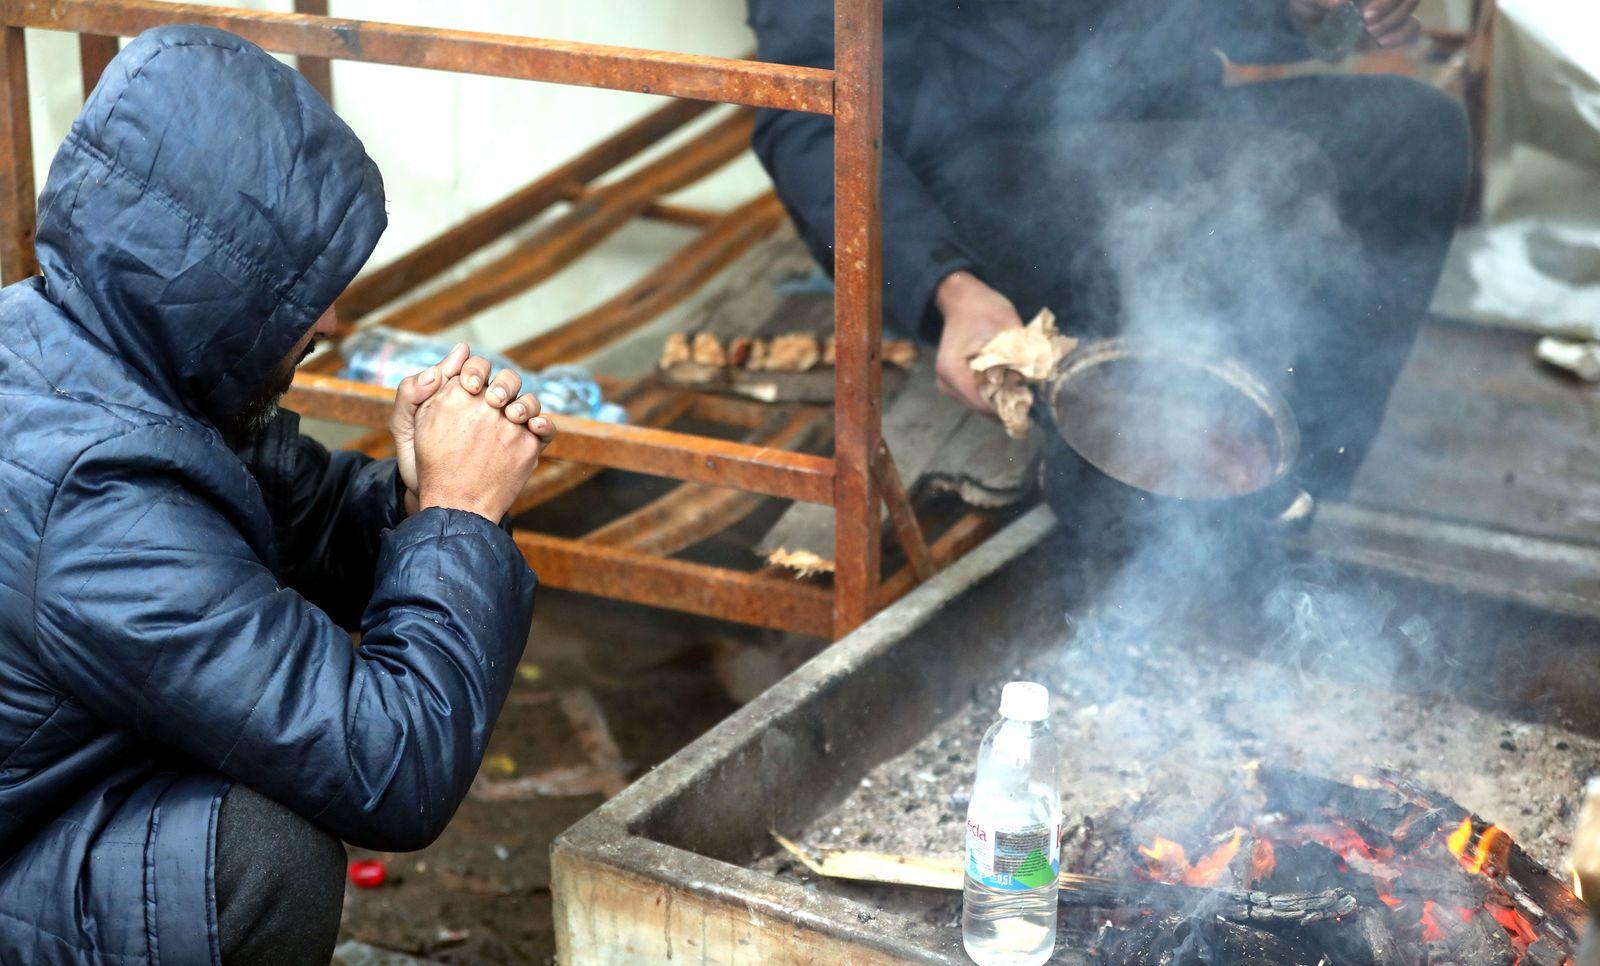 Migrants at Lipa refugee camp in Bihac, Bosnia And Herzegovina - 01 Jan 2021